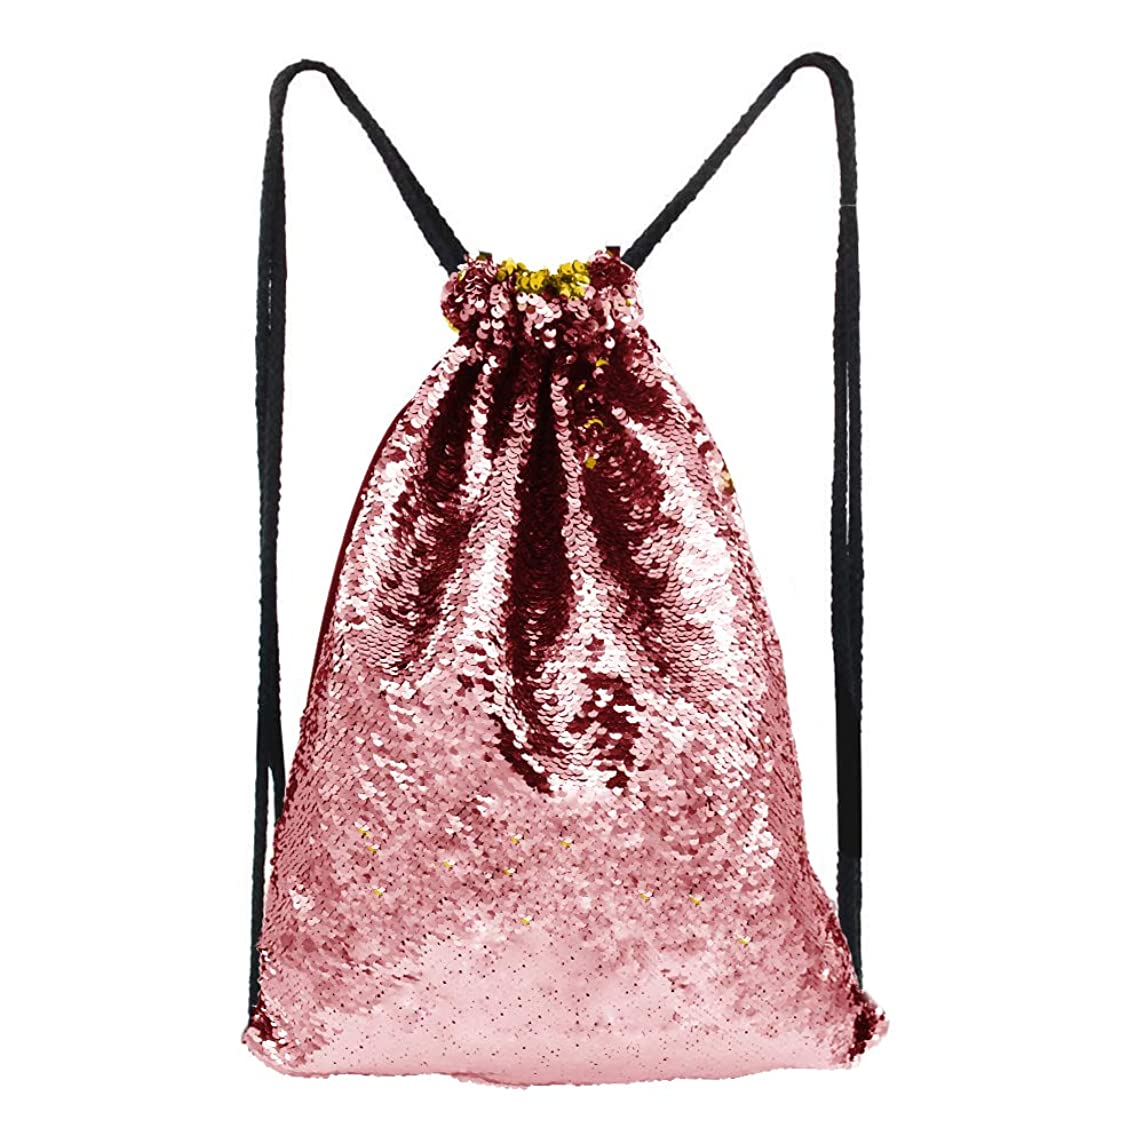 Alritz Mermaid Sequin Drawstring Bags, Reversible Sequin Gym Dance Backpacks Magic Glittering School Shoulder Bags Gift for Girls Kids Daughter Boy Women